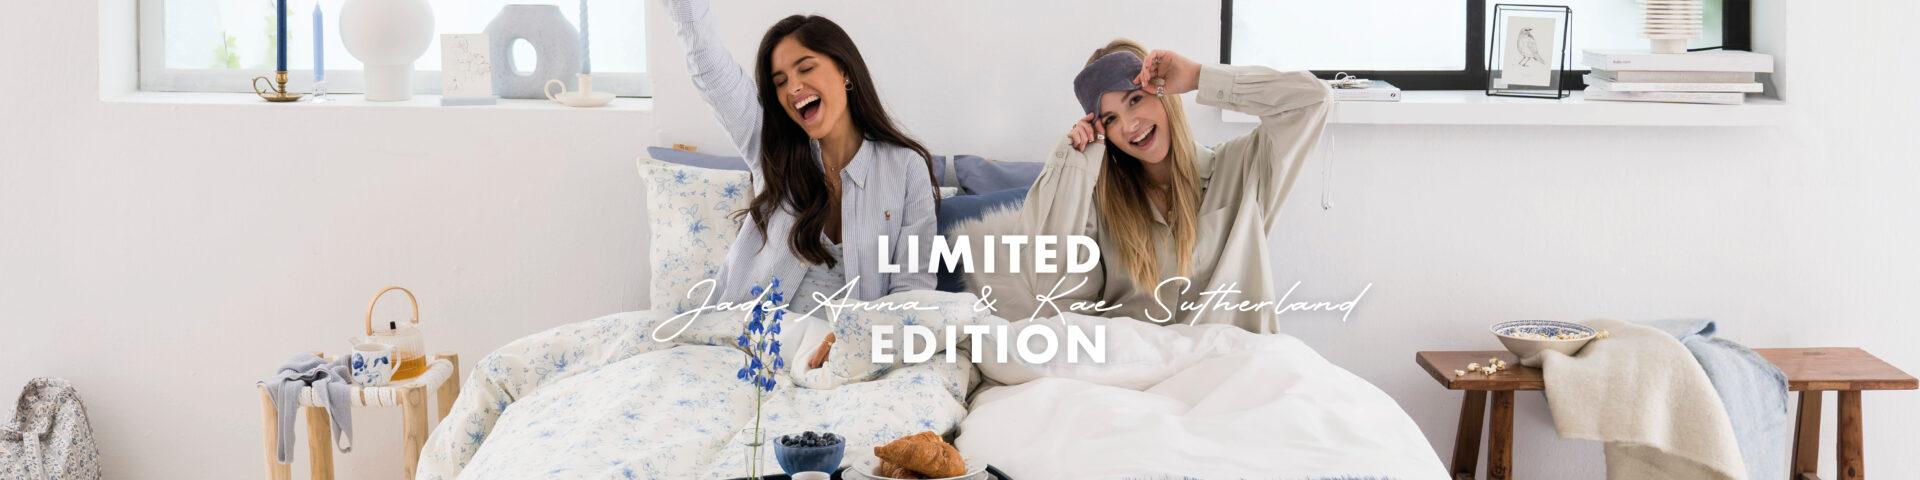 Limited-eollectie-influencers-Jade-Anna-Kae-Sutherland